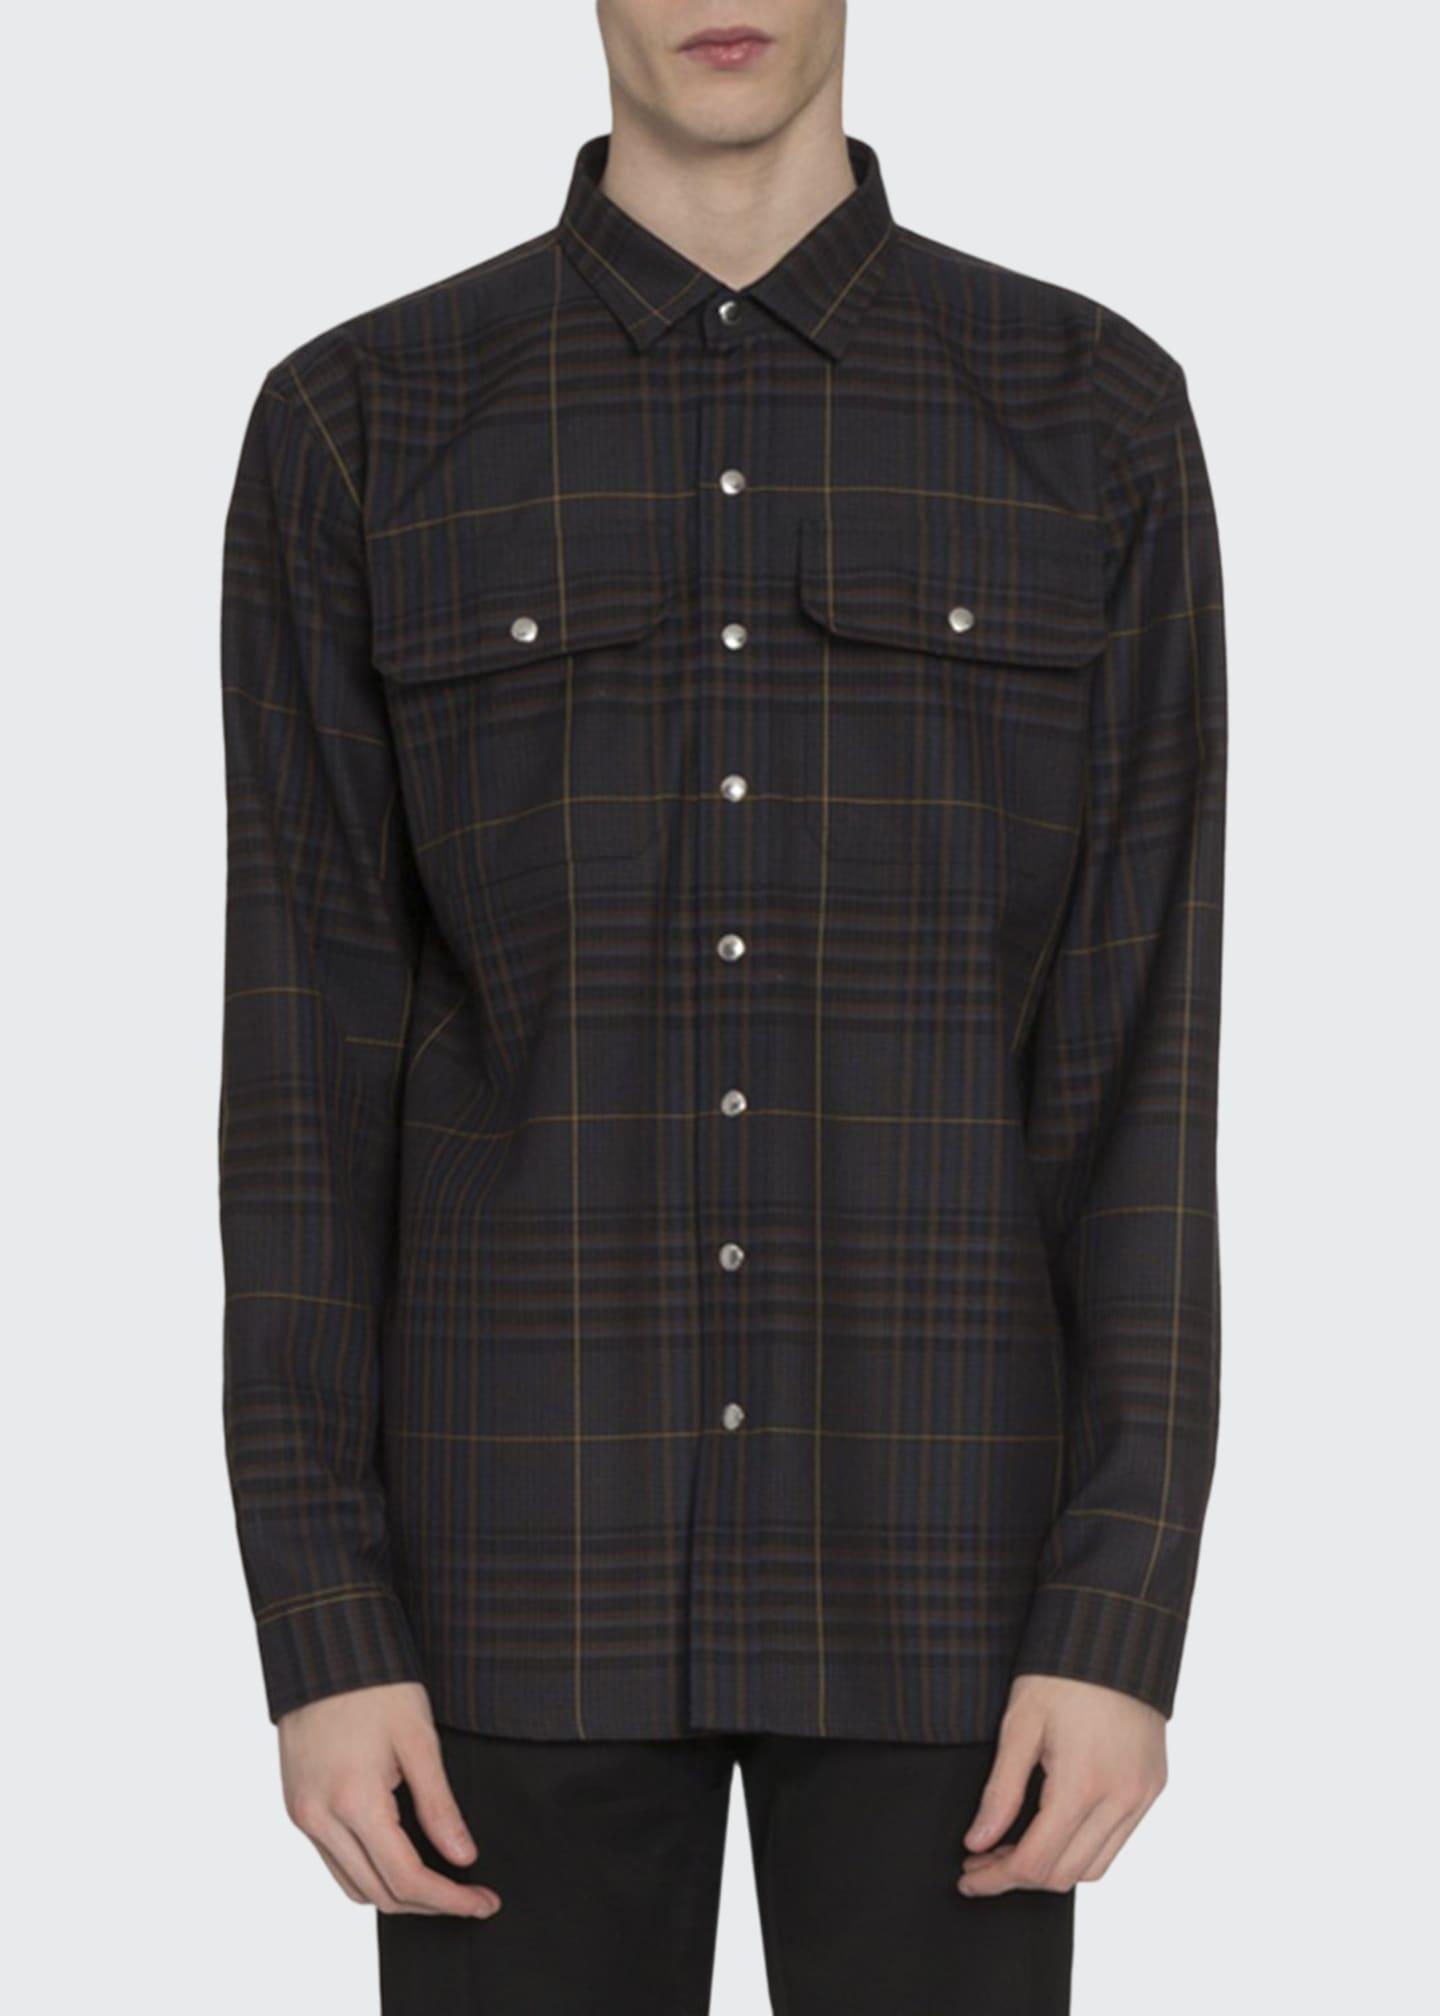 Berluti Men's Plaid Shirt Jacket